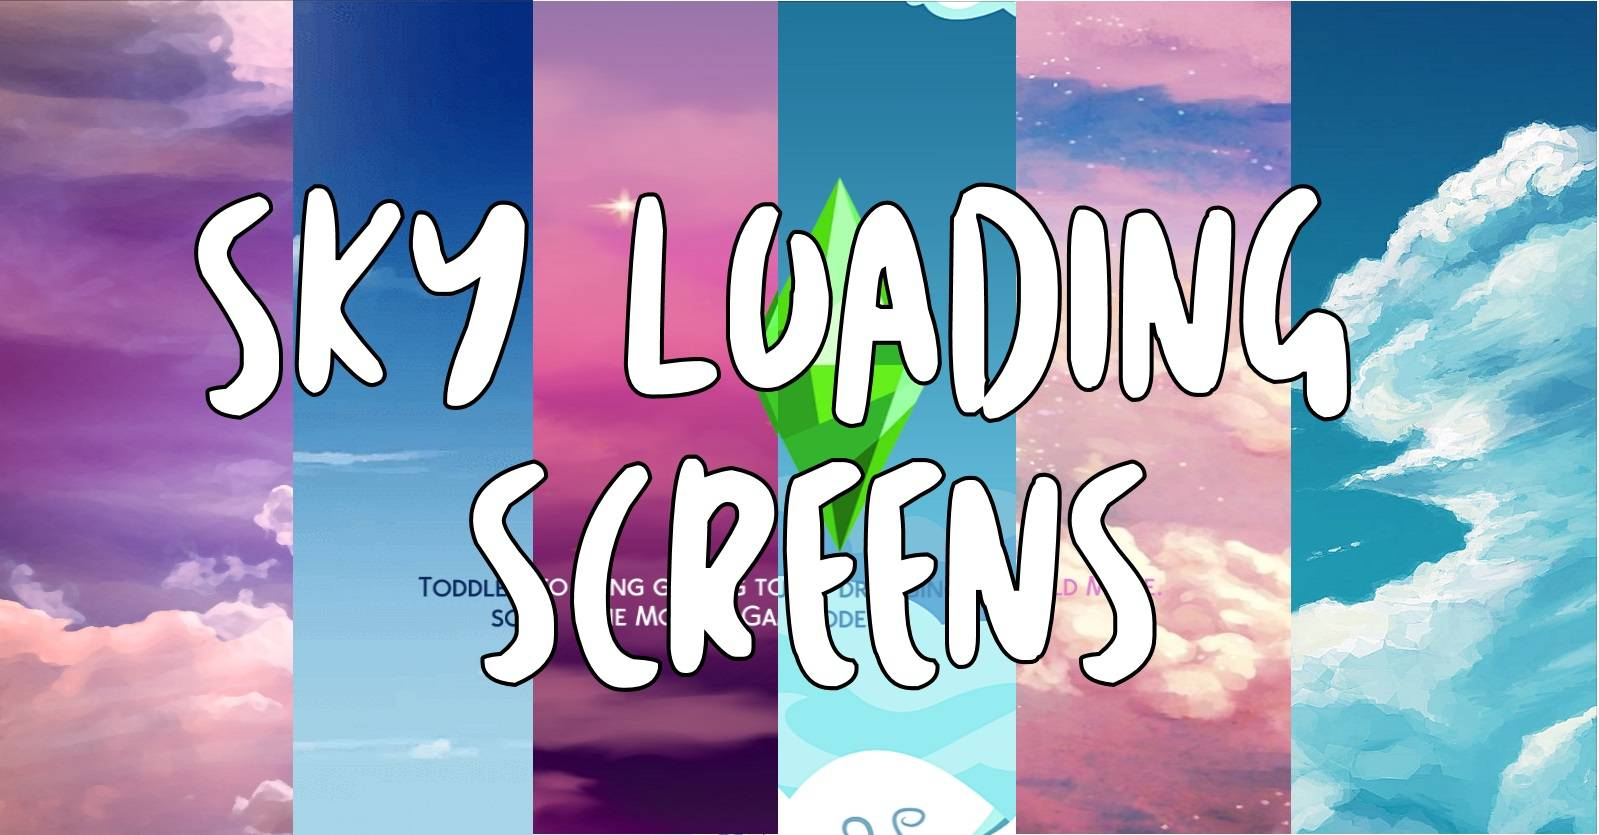 Фоны для экрана загрузки - Sky Loading Screens